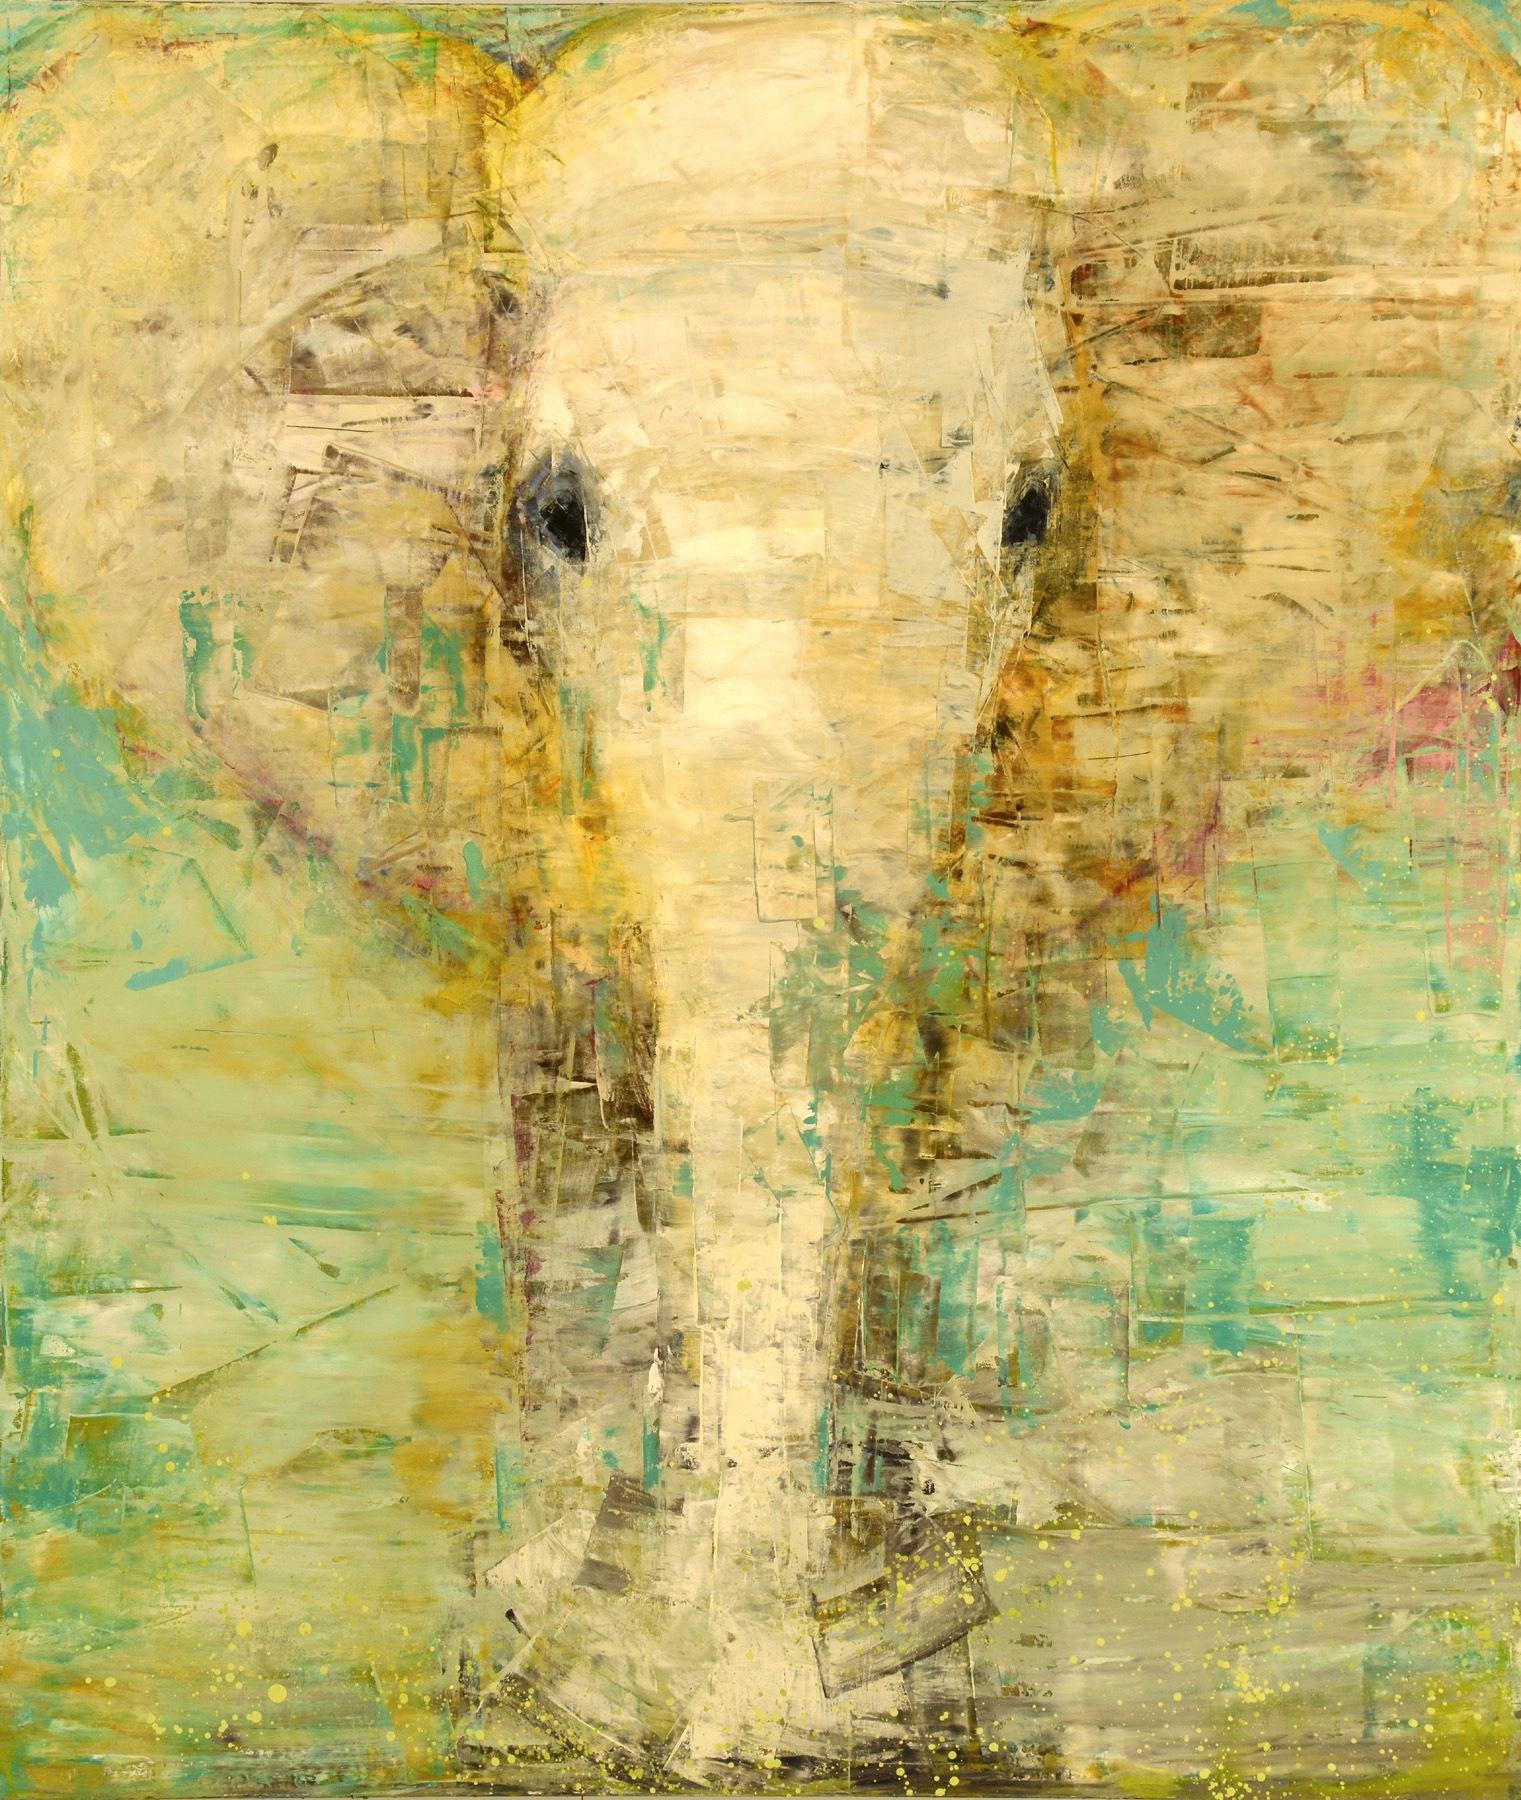 Elephant no. 3_56 x 48.jpg